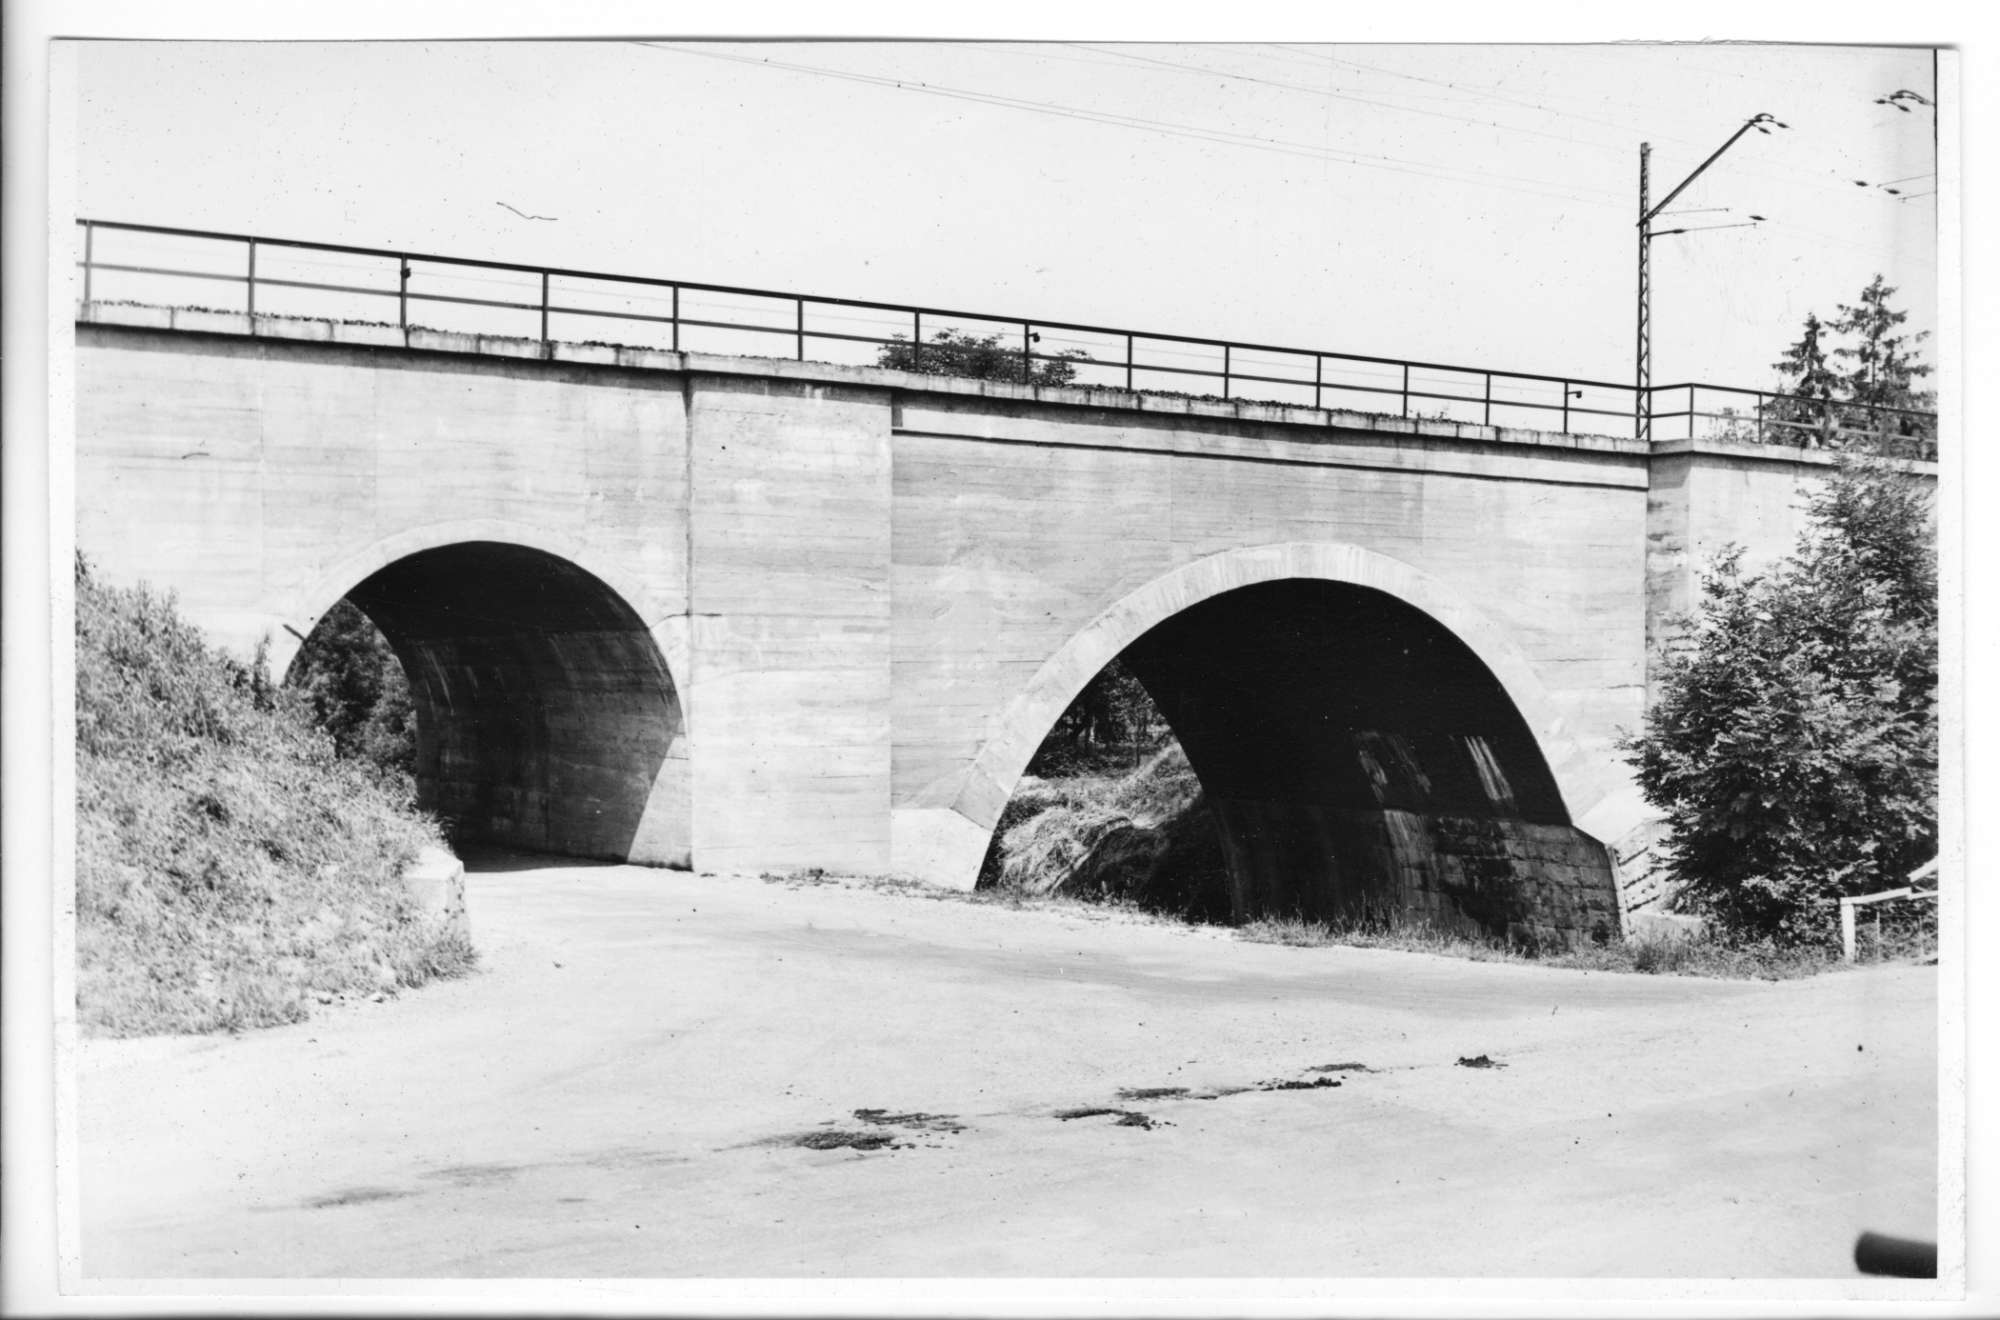 Metzingen, (Ermsbrücke), Wasserschäden, Abb. c